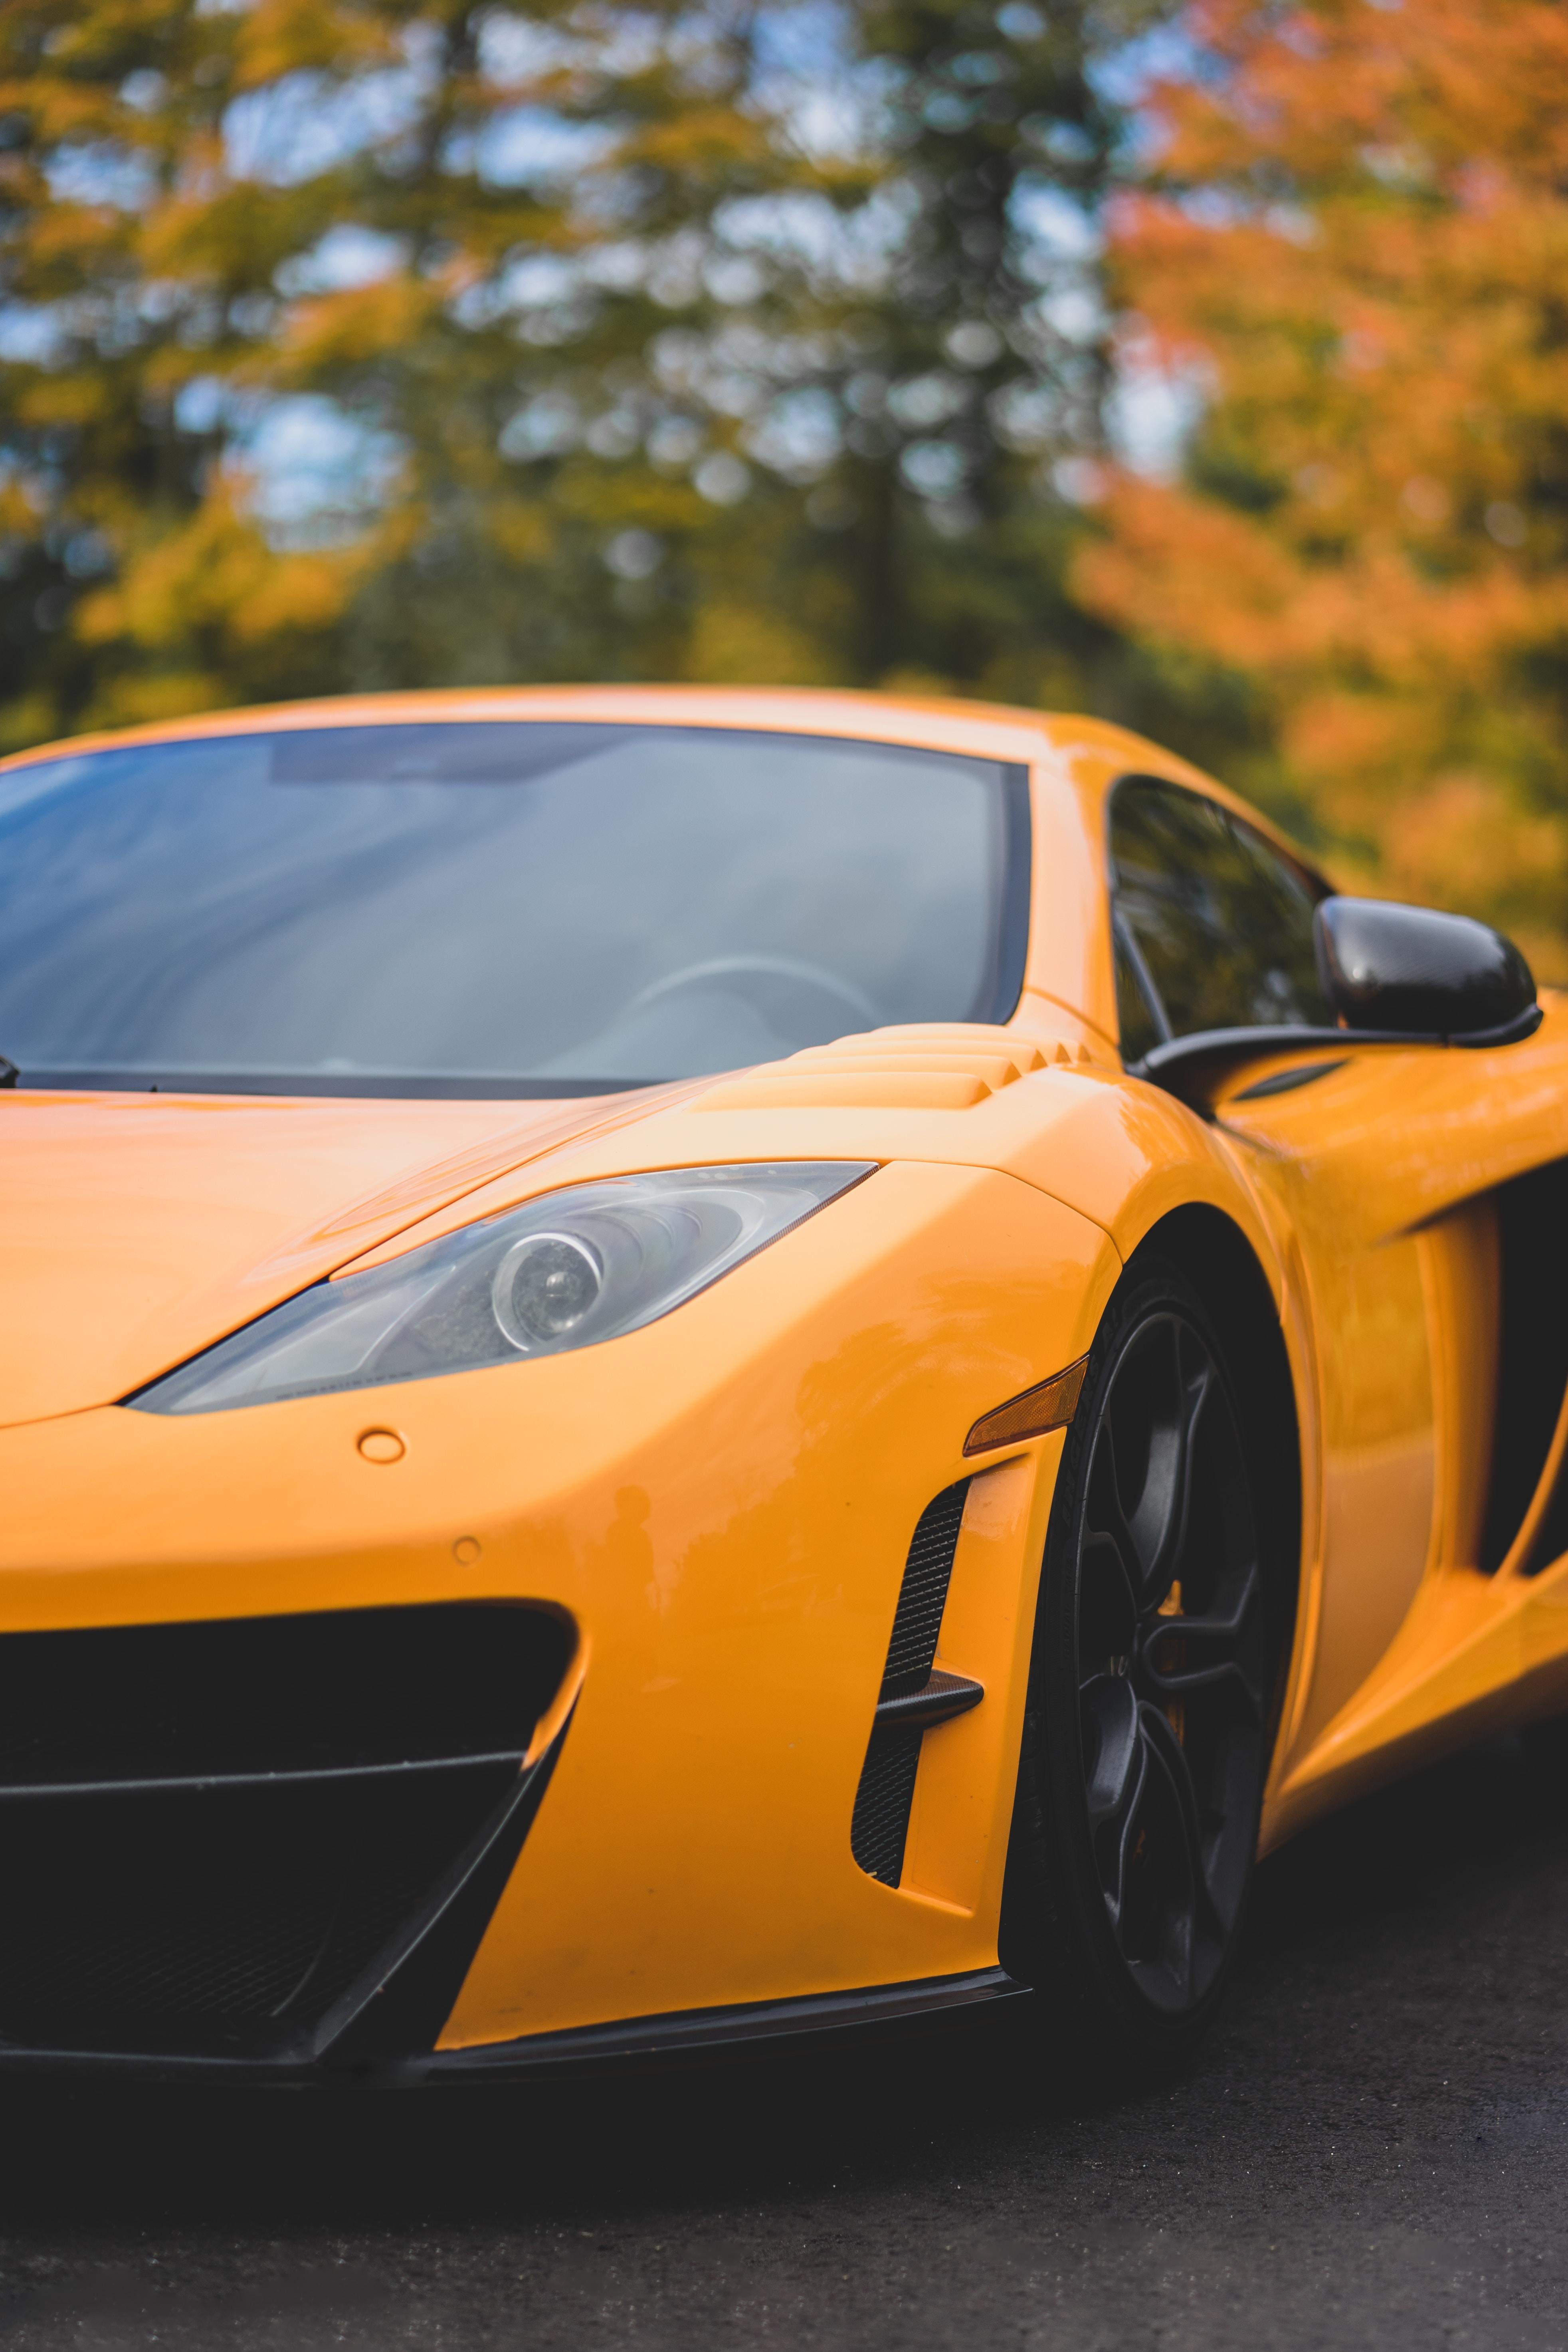 orange sports car near trees